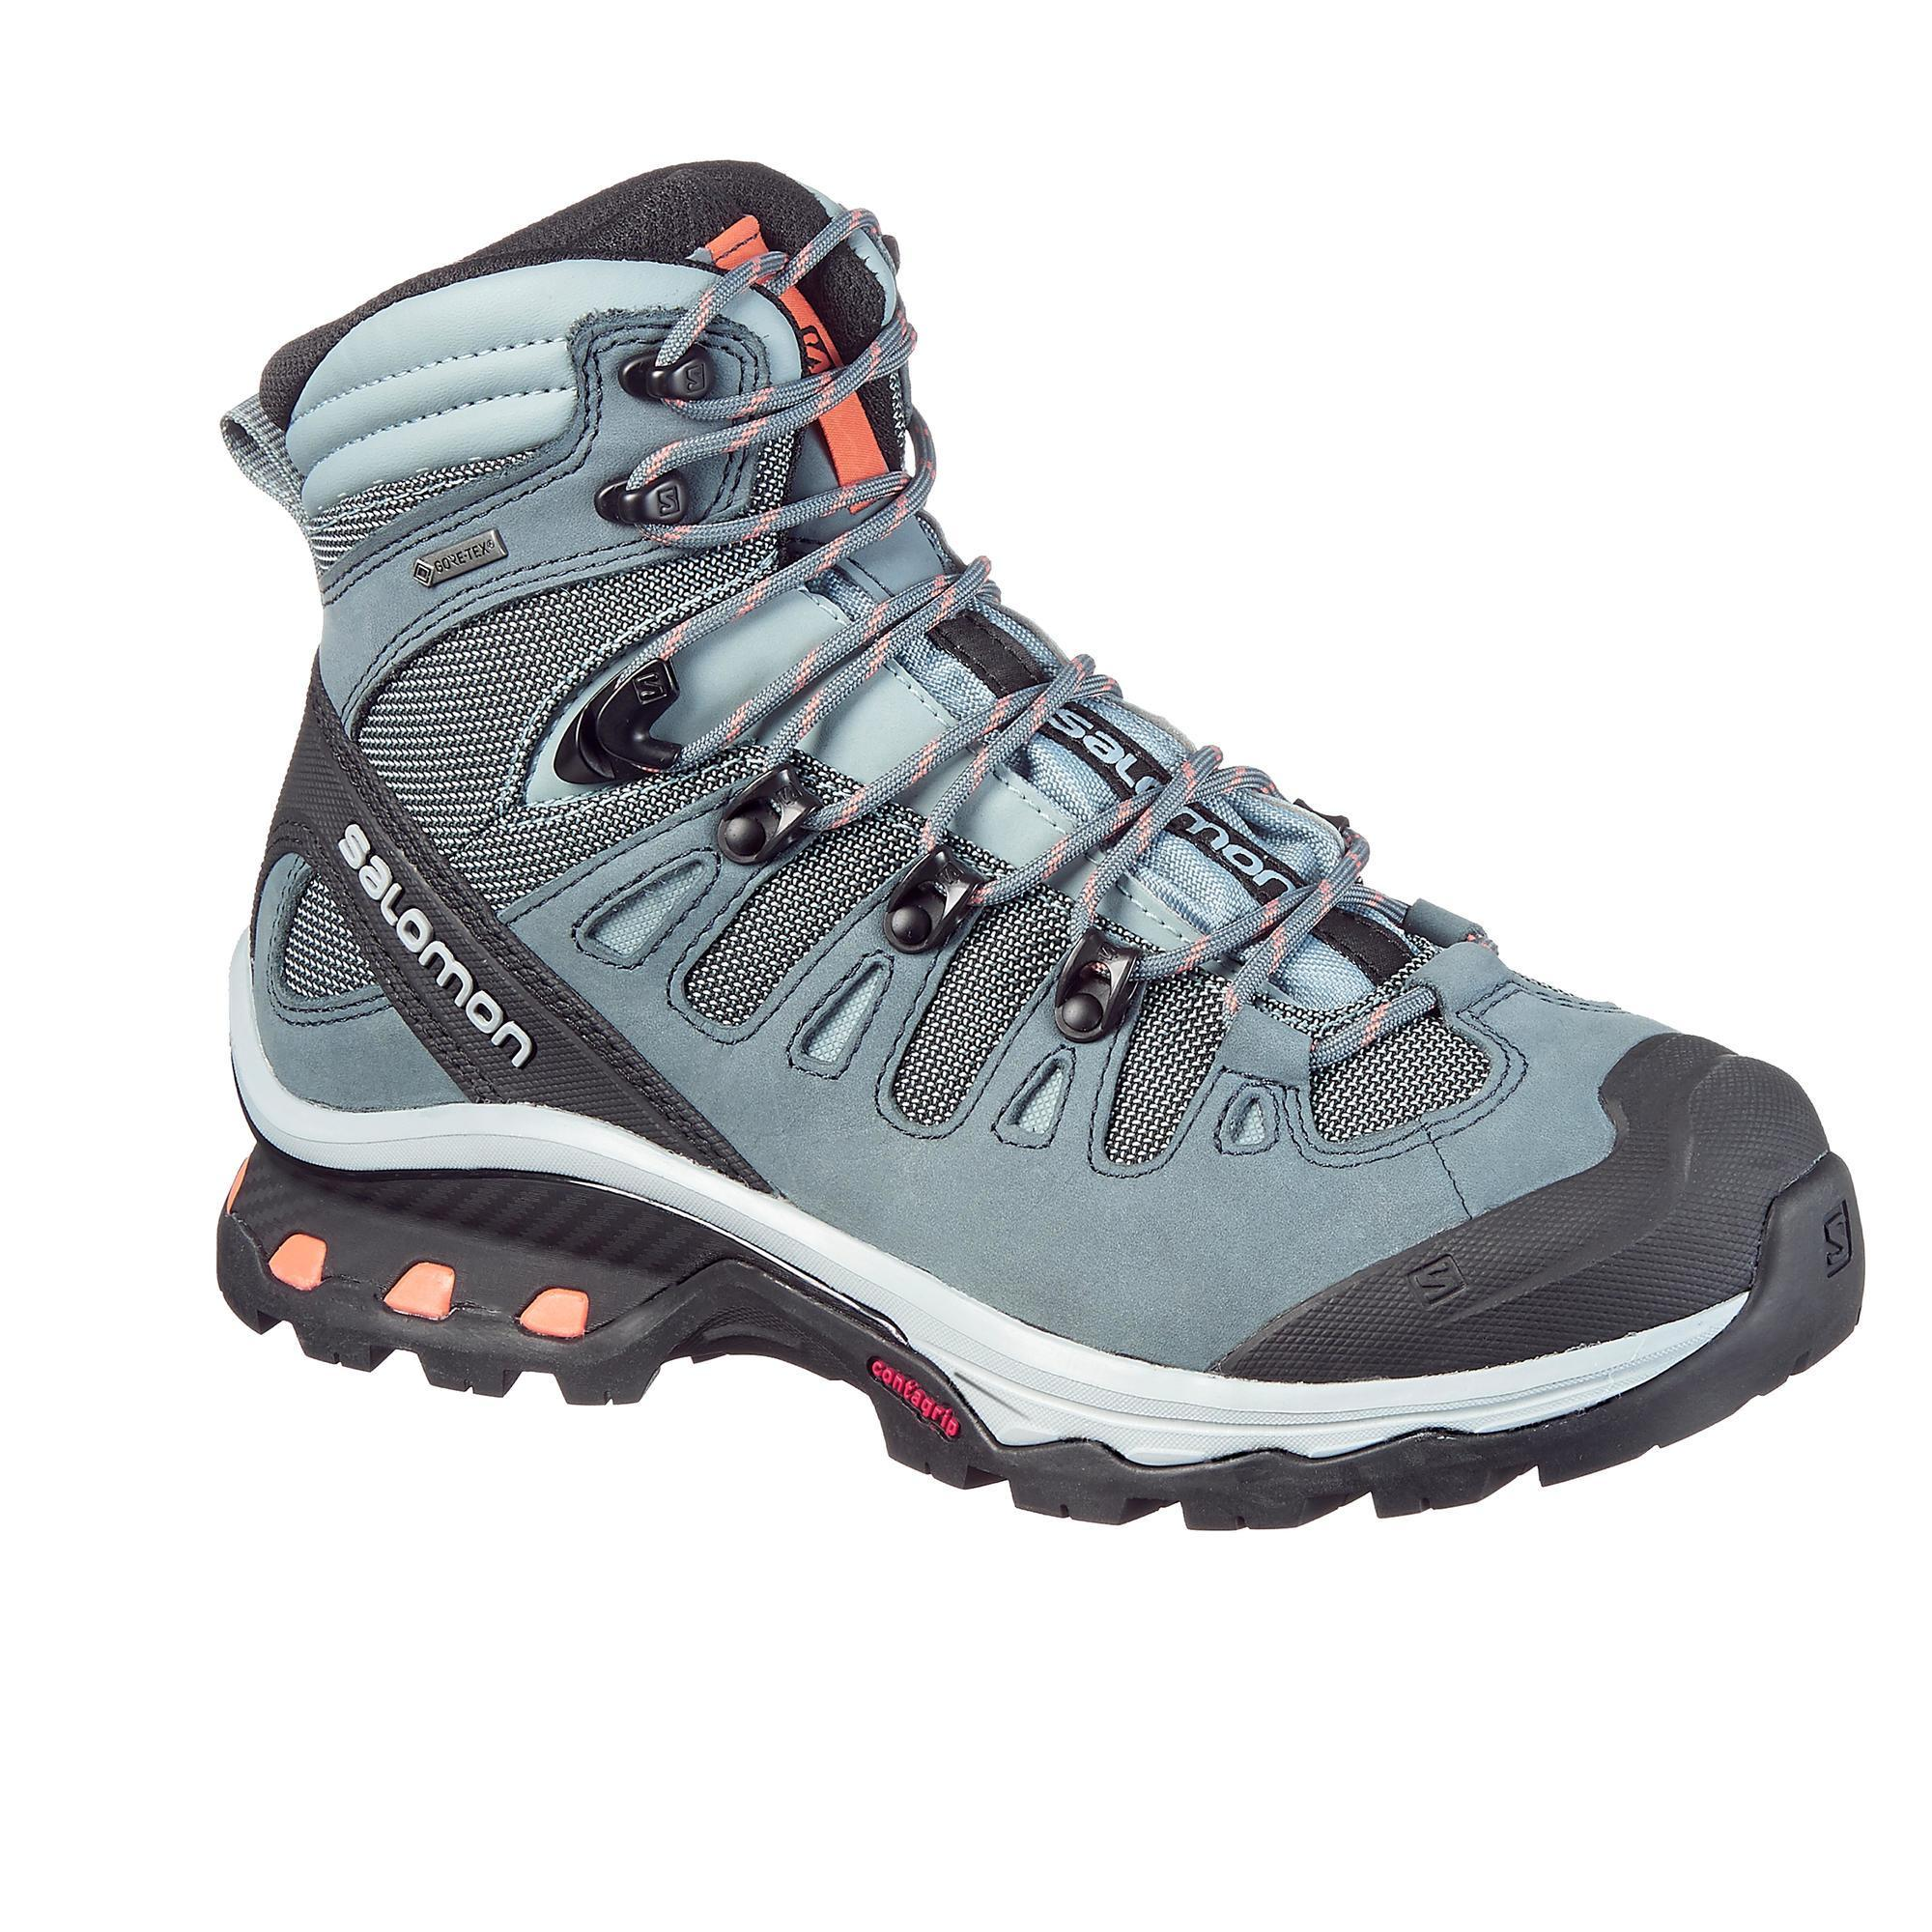 Hiking Boots, Waterproof Walking Boots